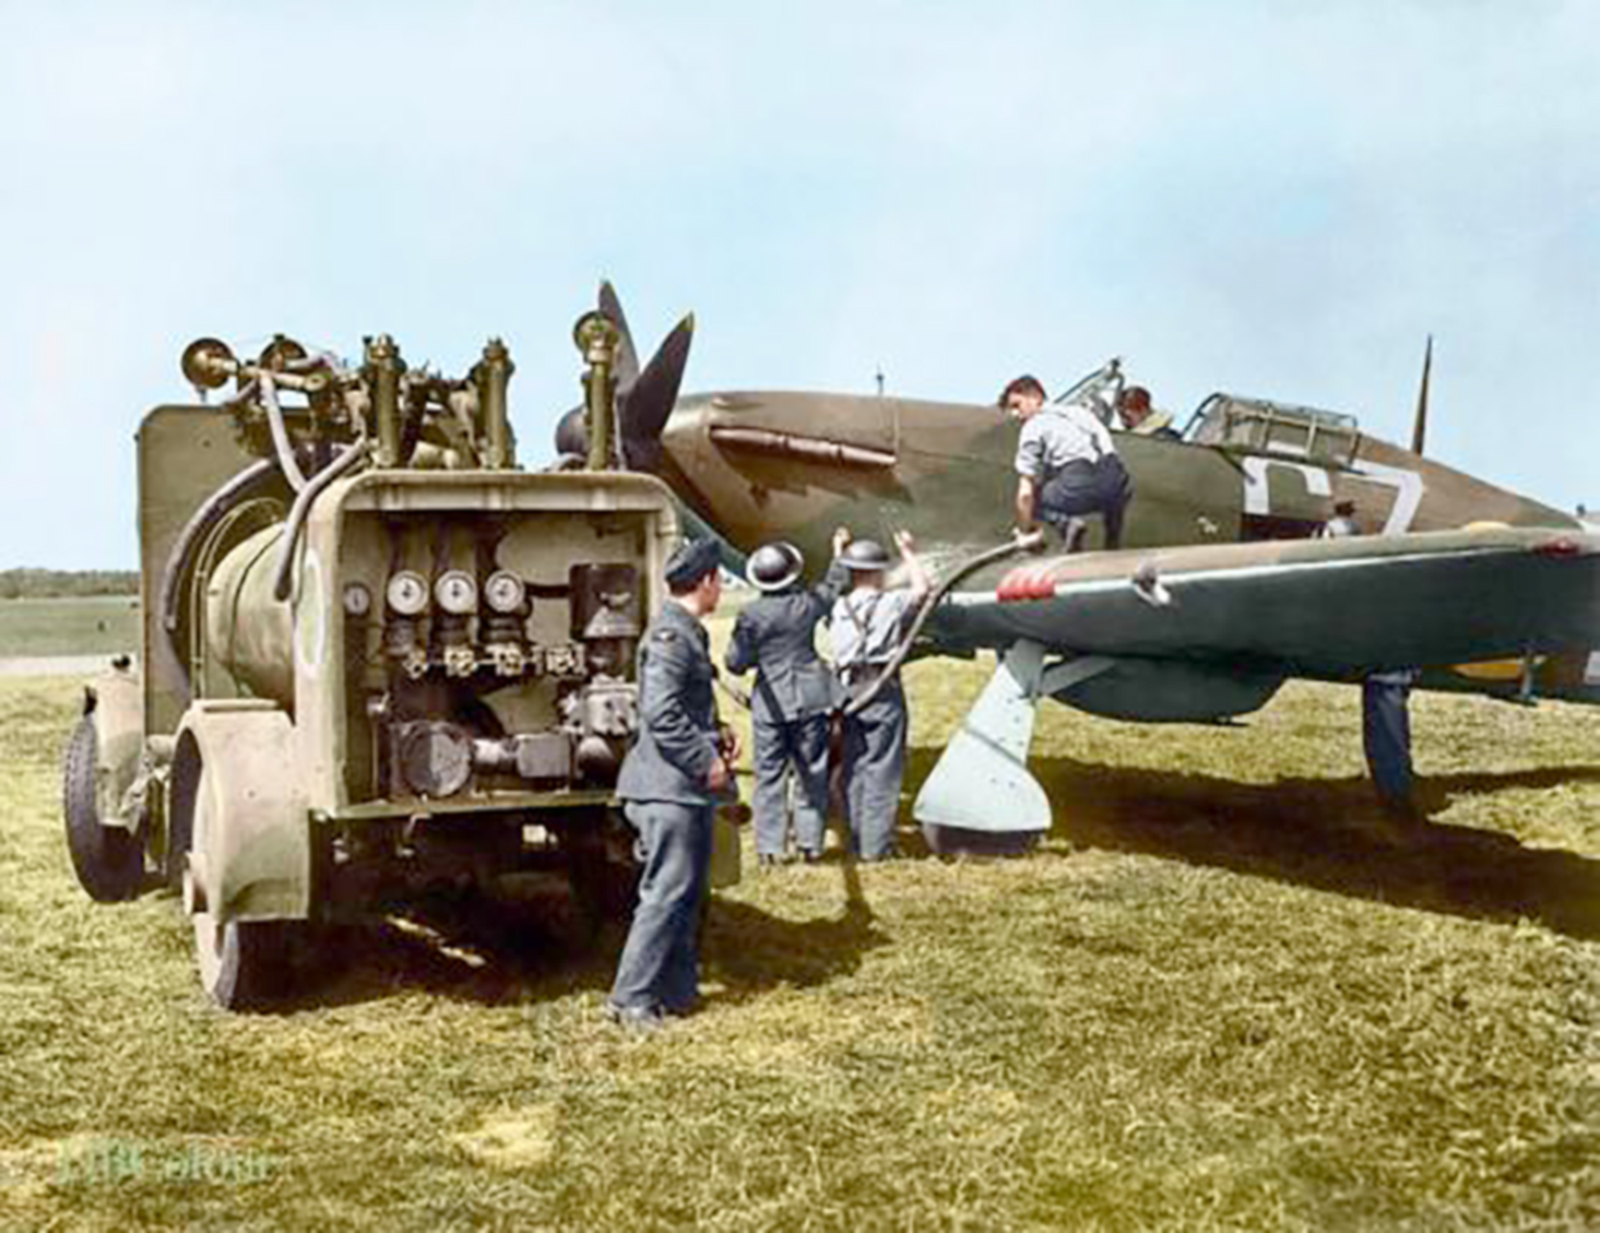 Hurricane I RAF 32Sqn GZL P2921 being refueled Biggin Hill Aug 1940 IWM HU57450a